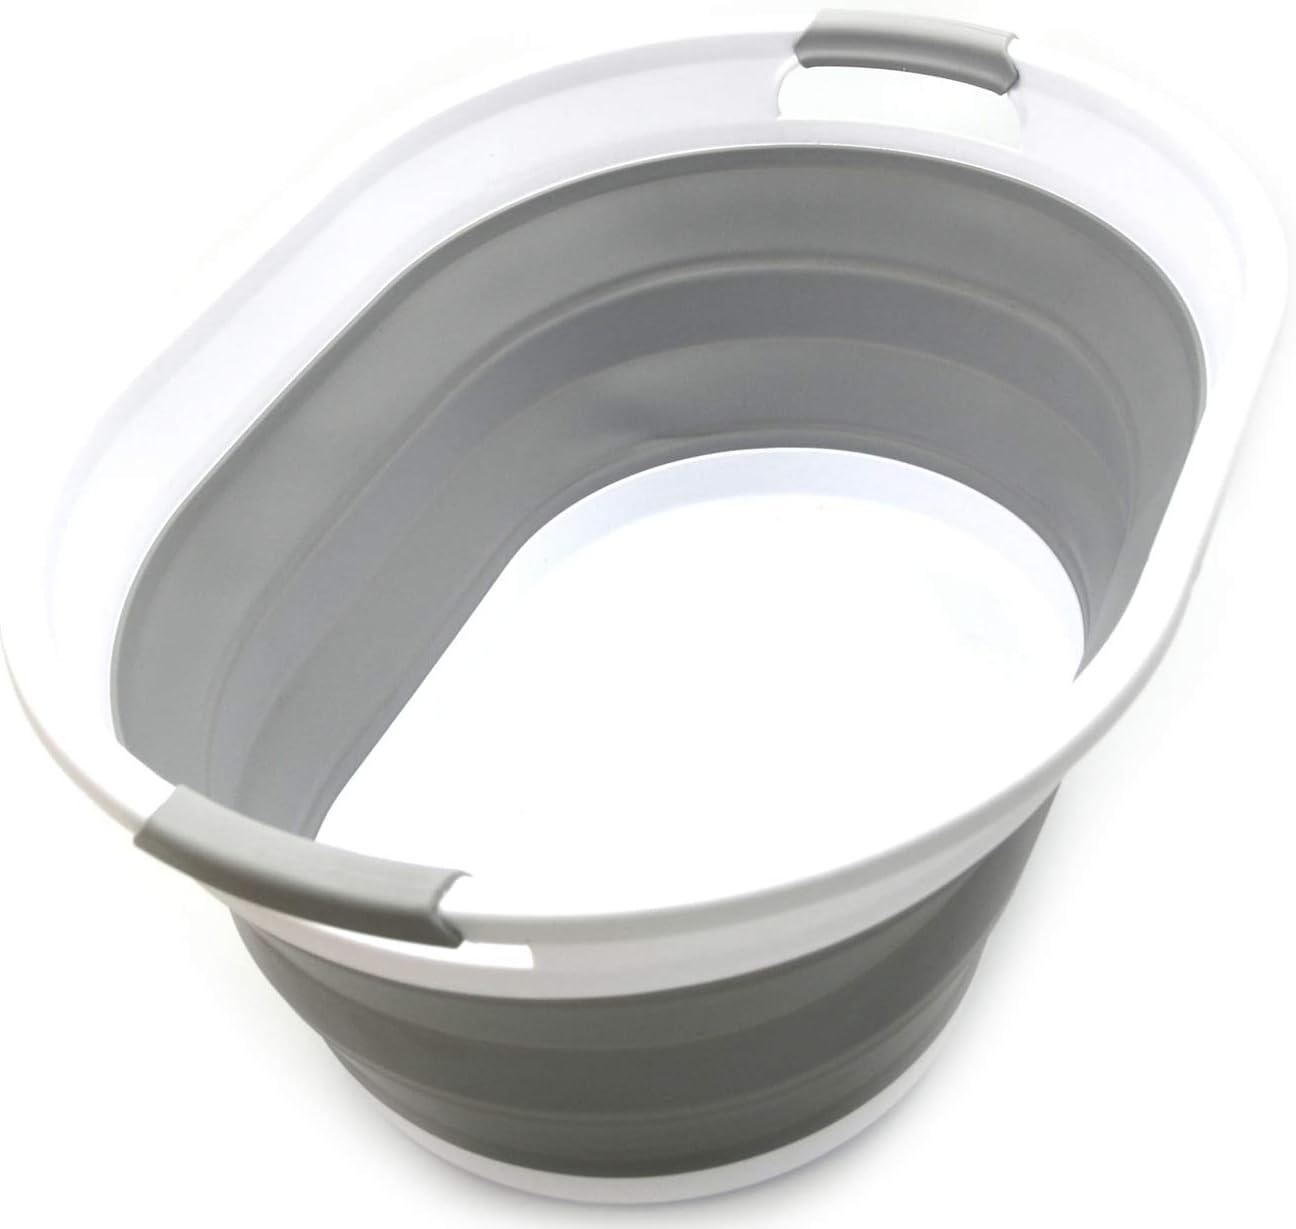 SAMMART Collapsible Plastic Japan Maker New Laundry Basket F - Oval Tub Under blast sales